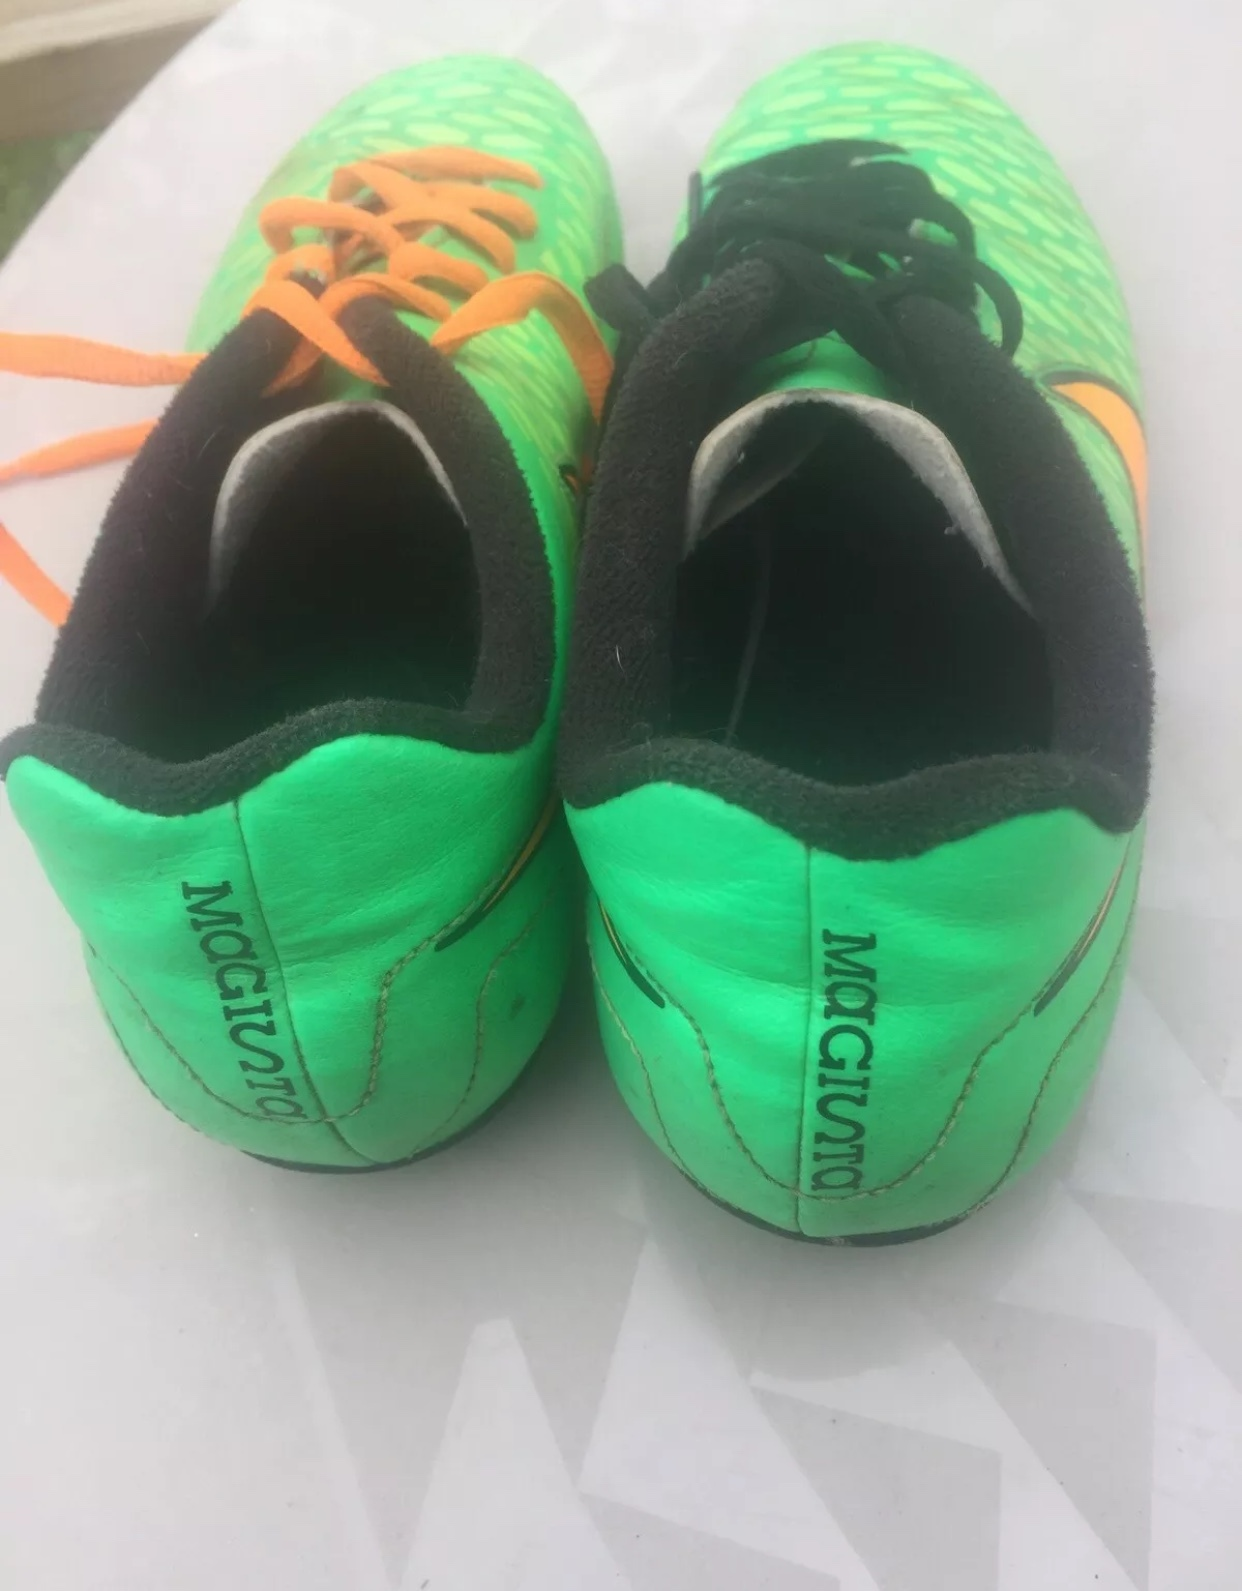 nike magista onda green soccer shoes cleats 4.5 snake alligator crocodile croc